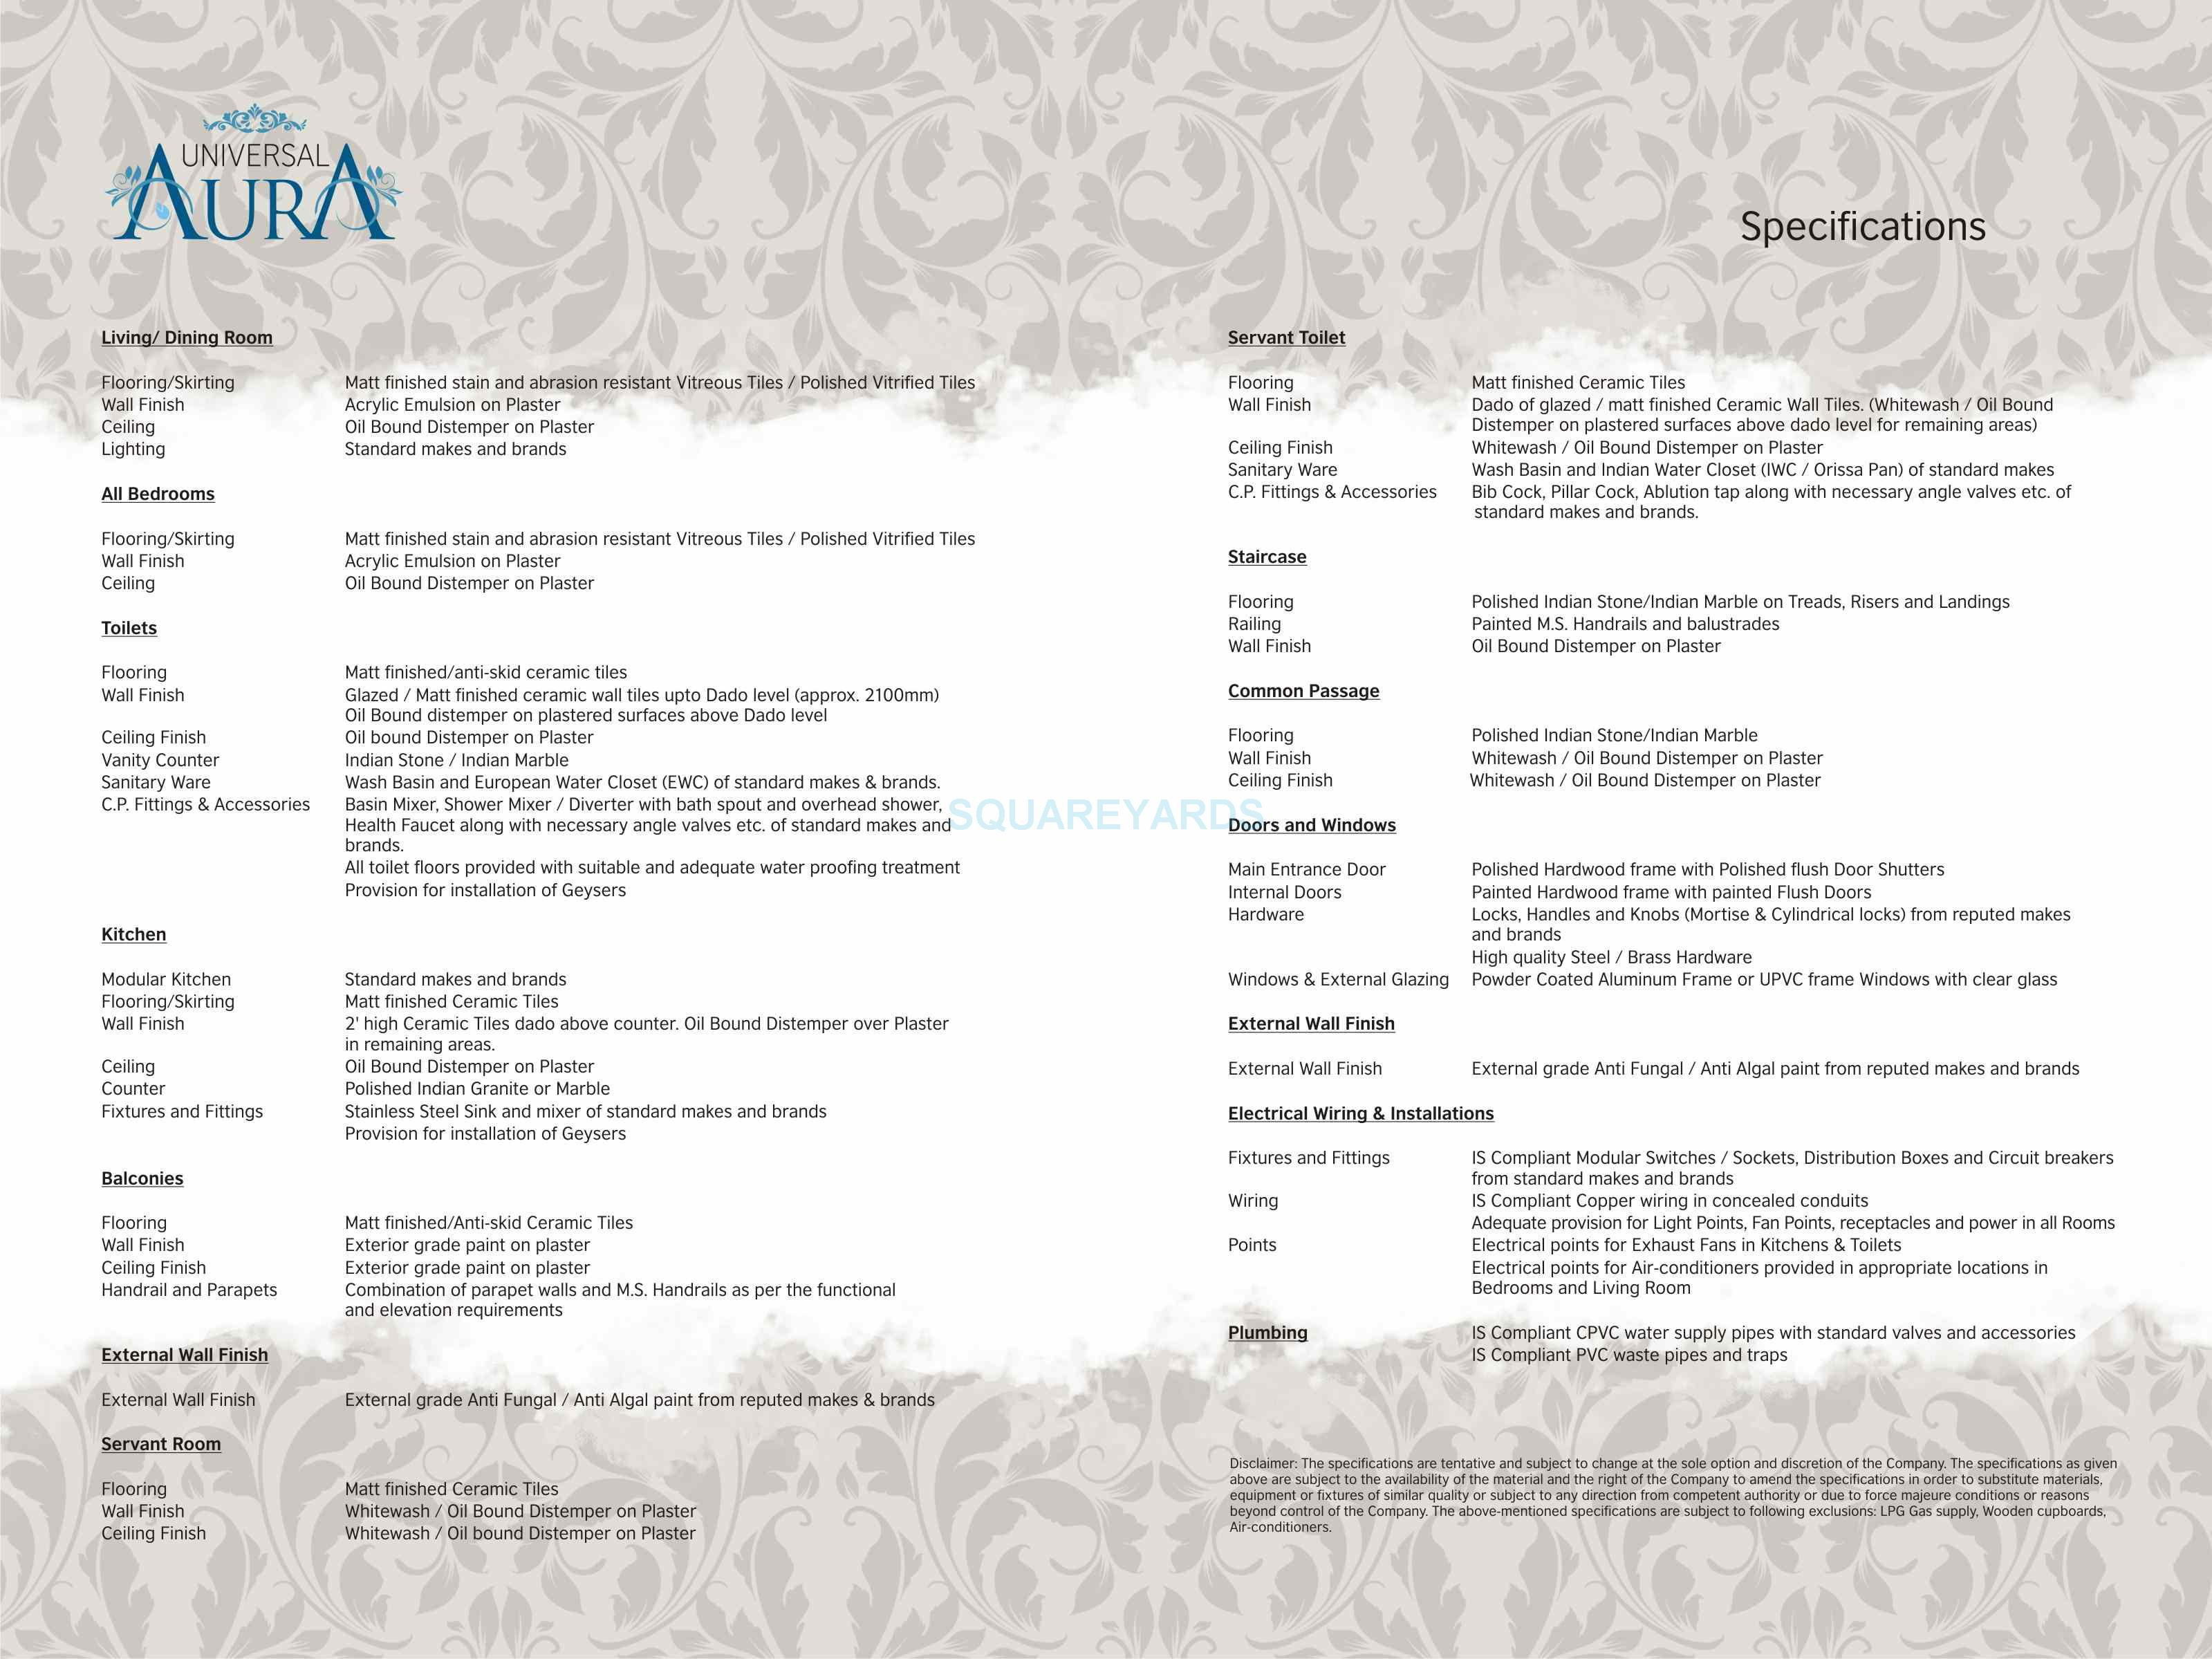 universal aura specification1